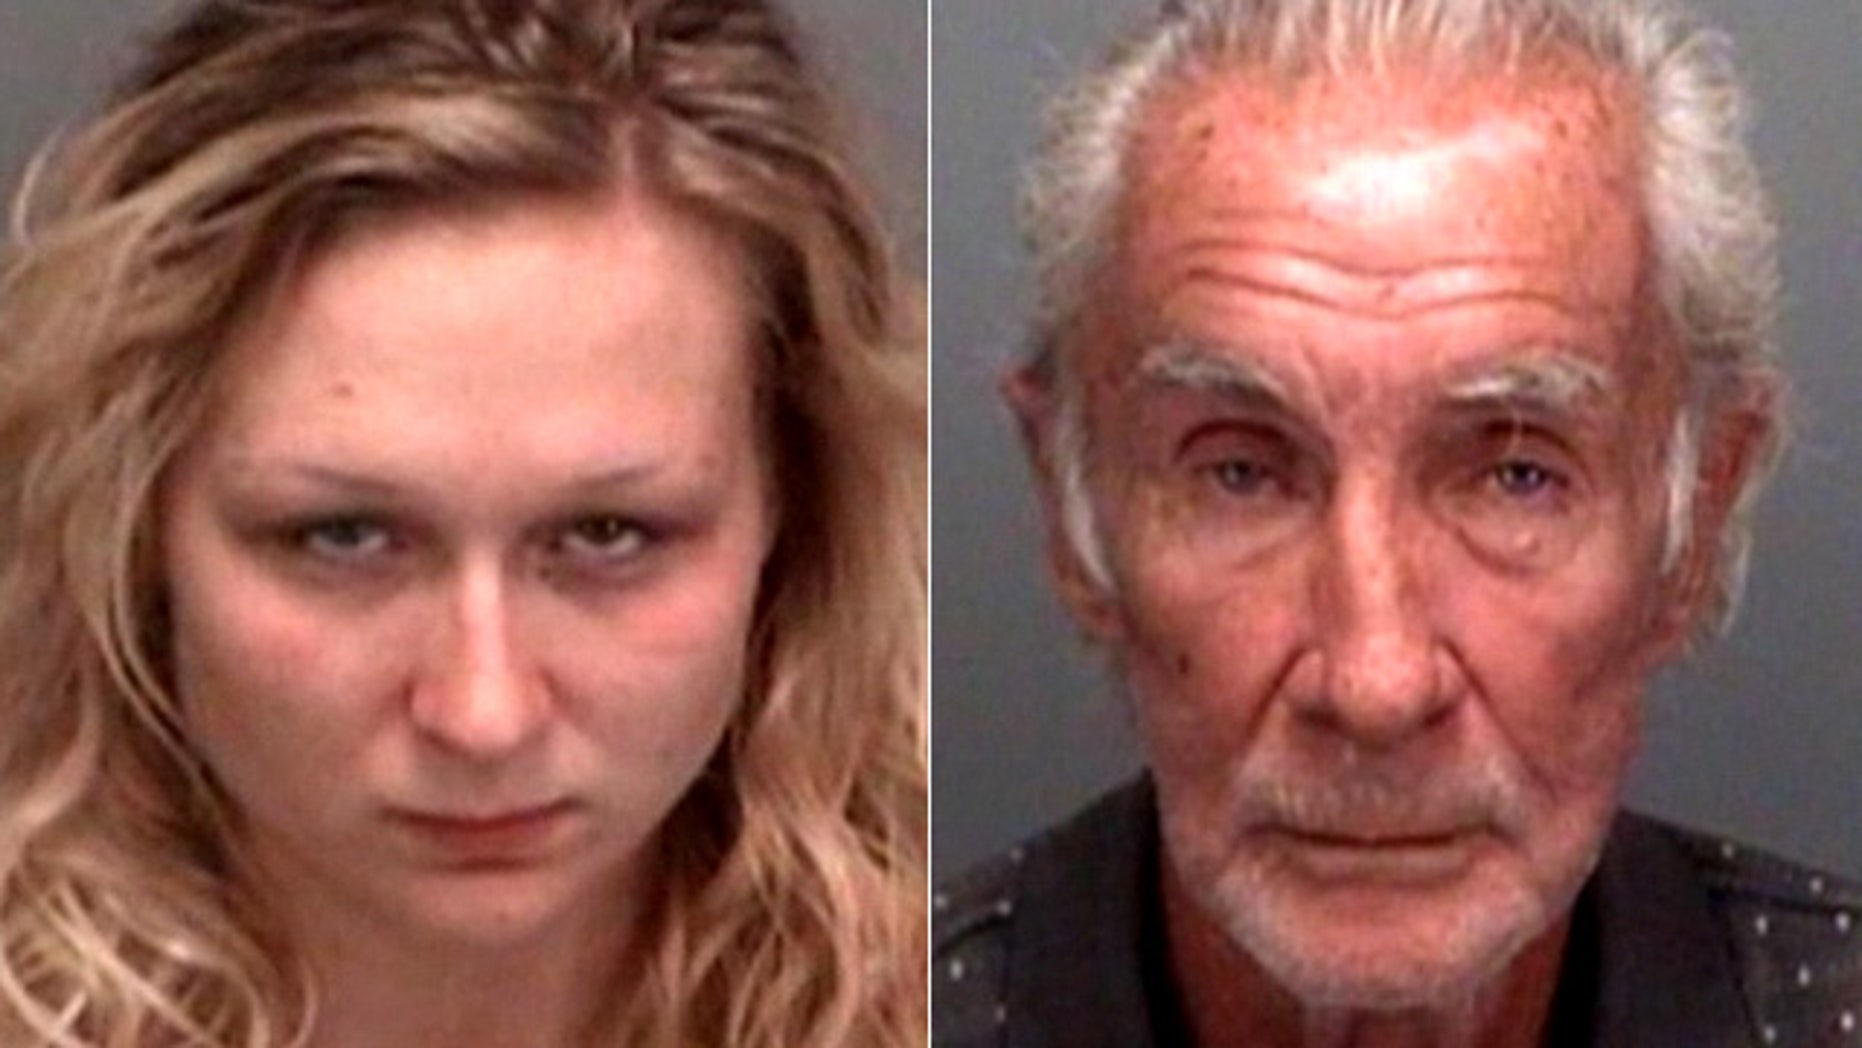 Josephine Rebecca Smith, left, allegedly attacked Milton Ellis.